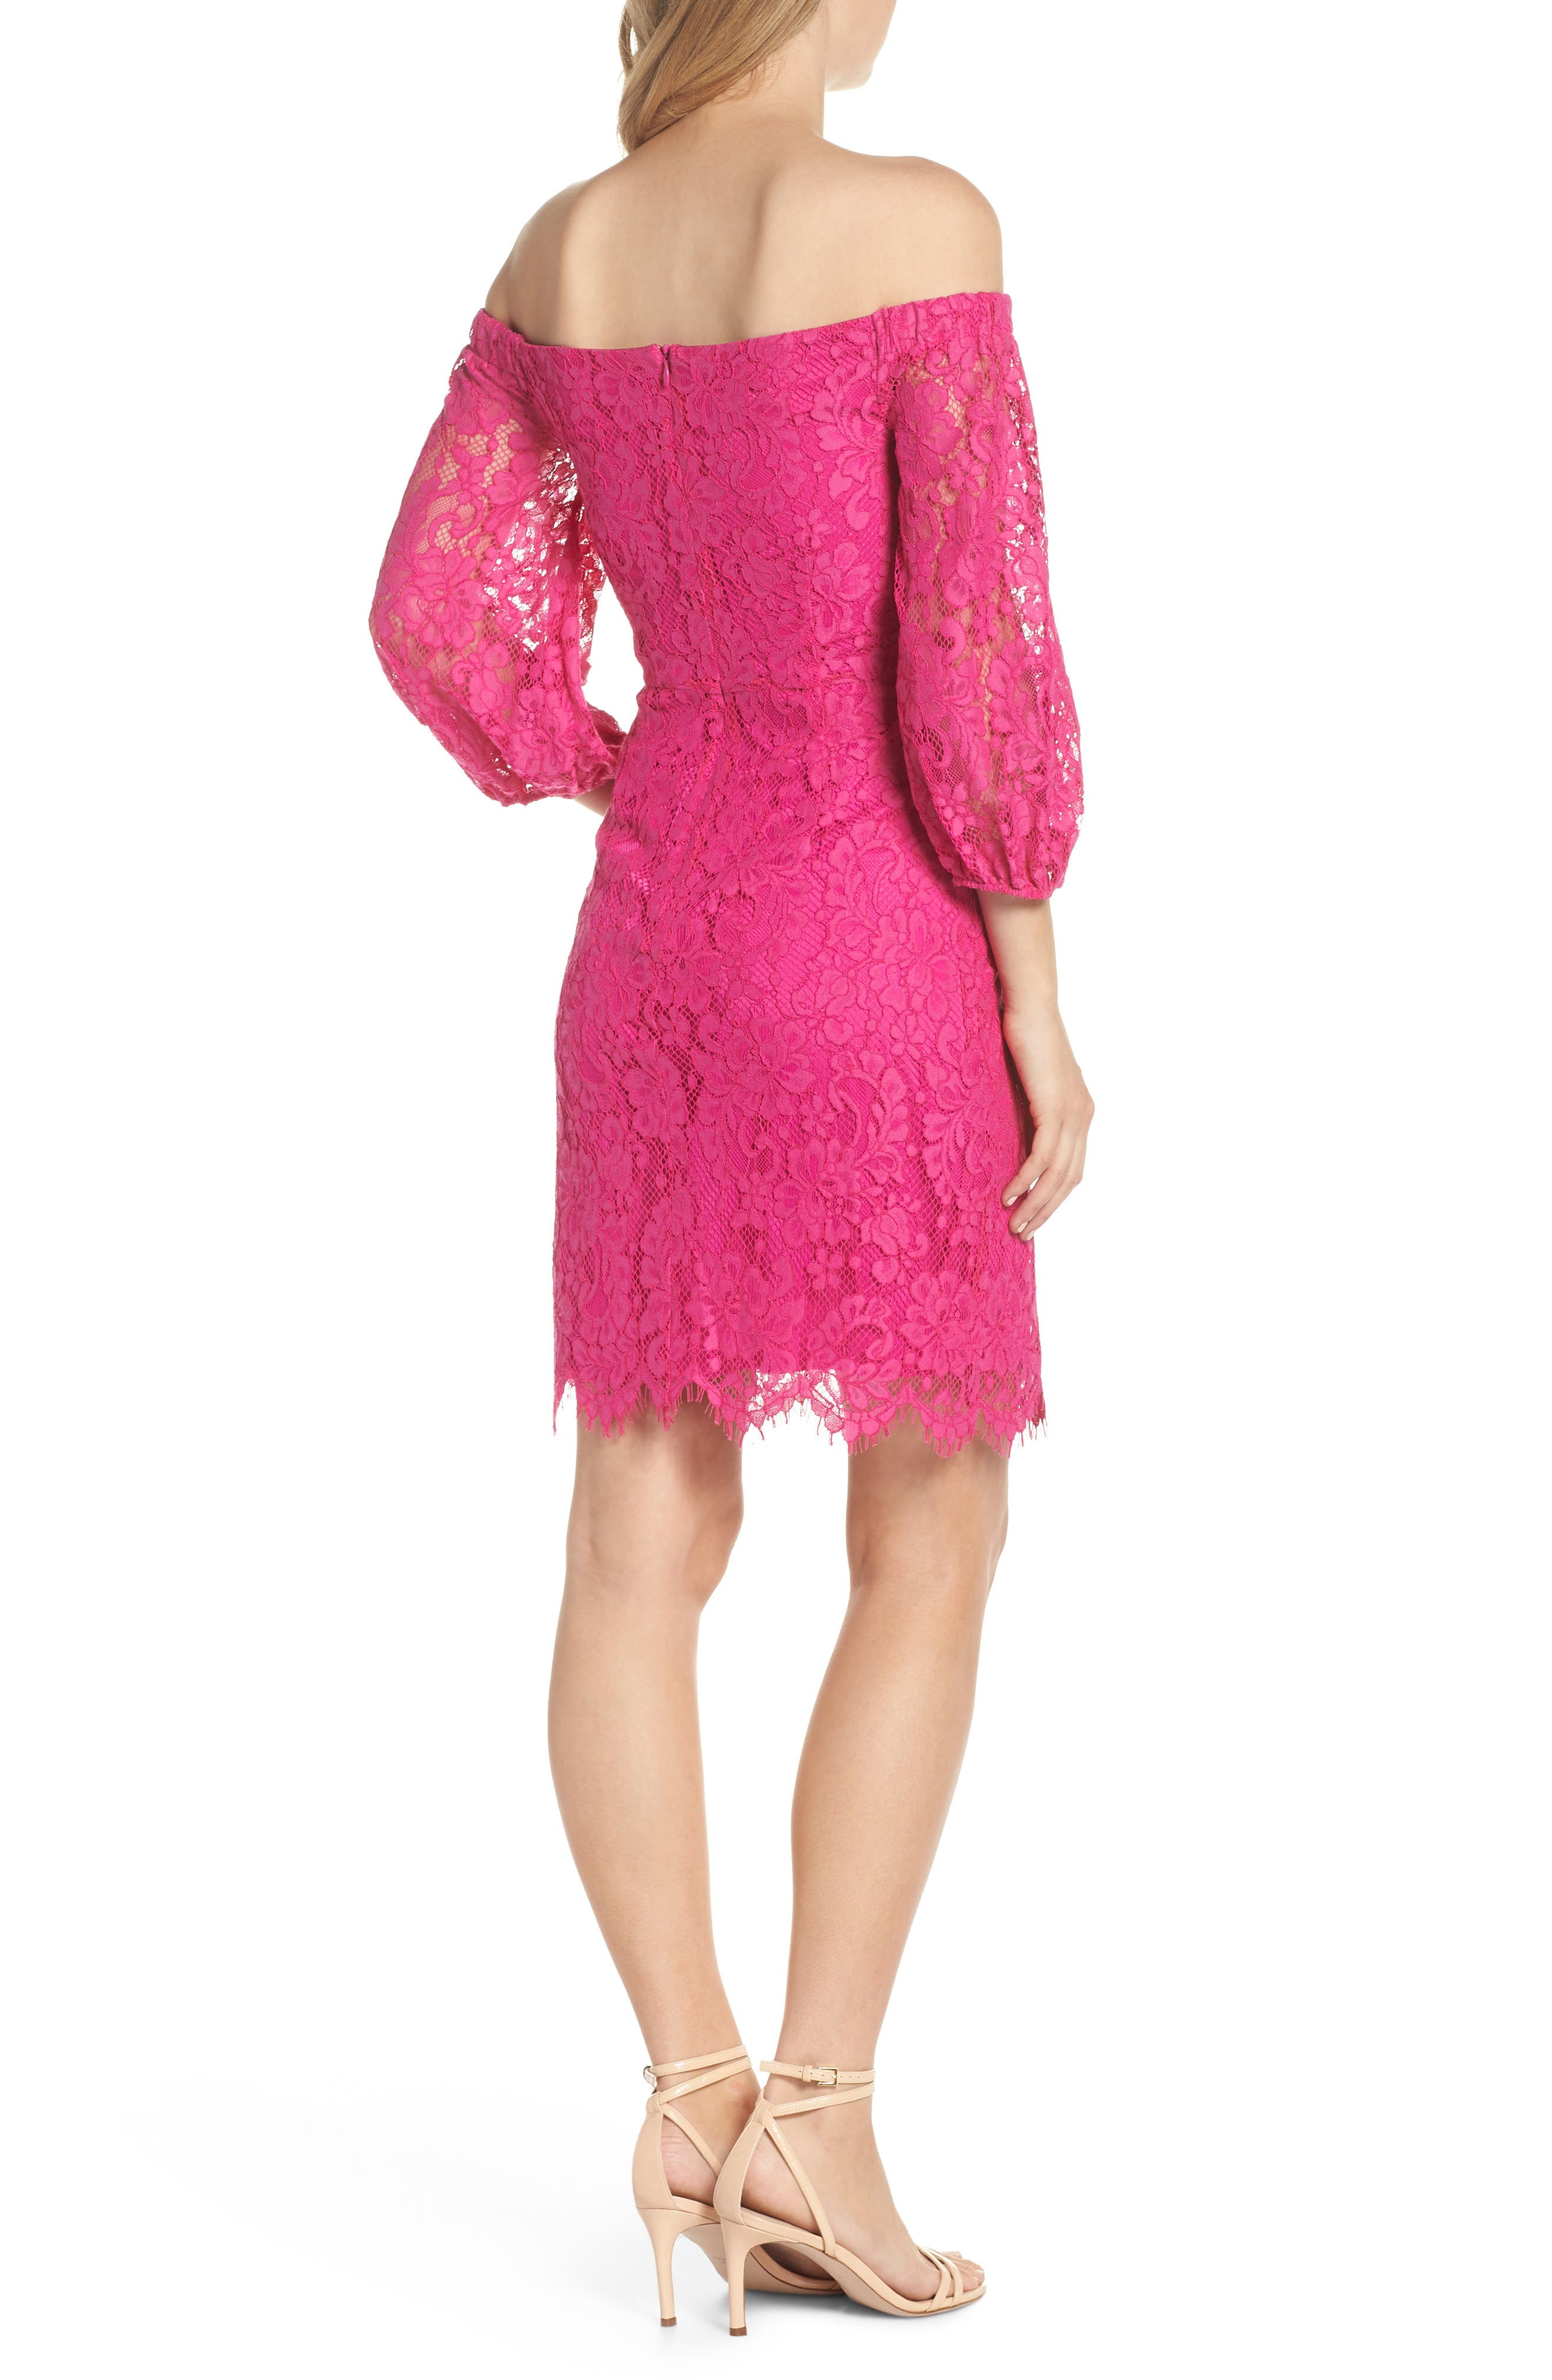 Azul Scallop Hem Off the Shoulder Lace Dress,                             Alternate thumbnail 2, color,                             BRILLIANT FUCHSIA